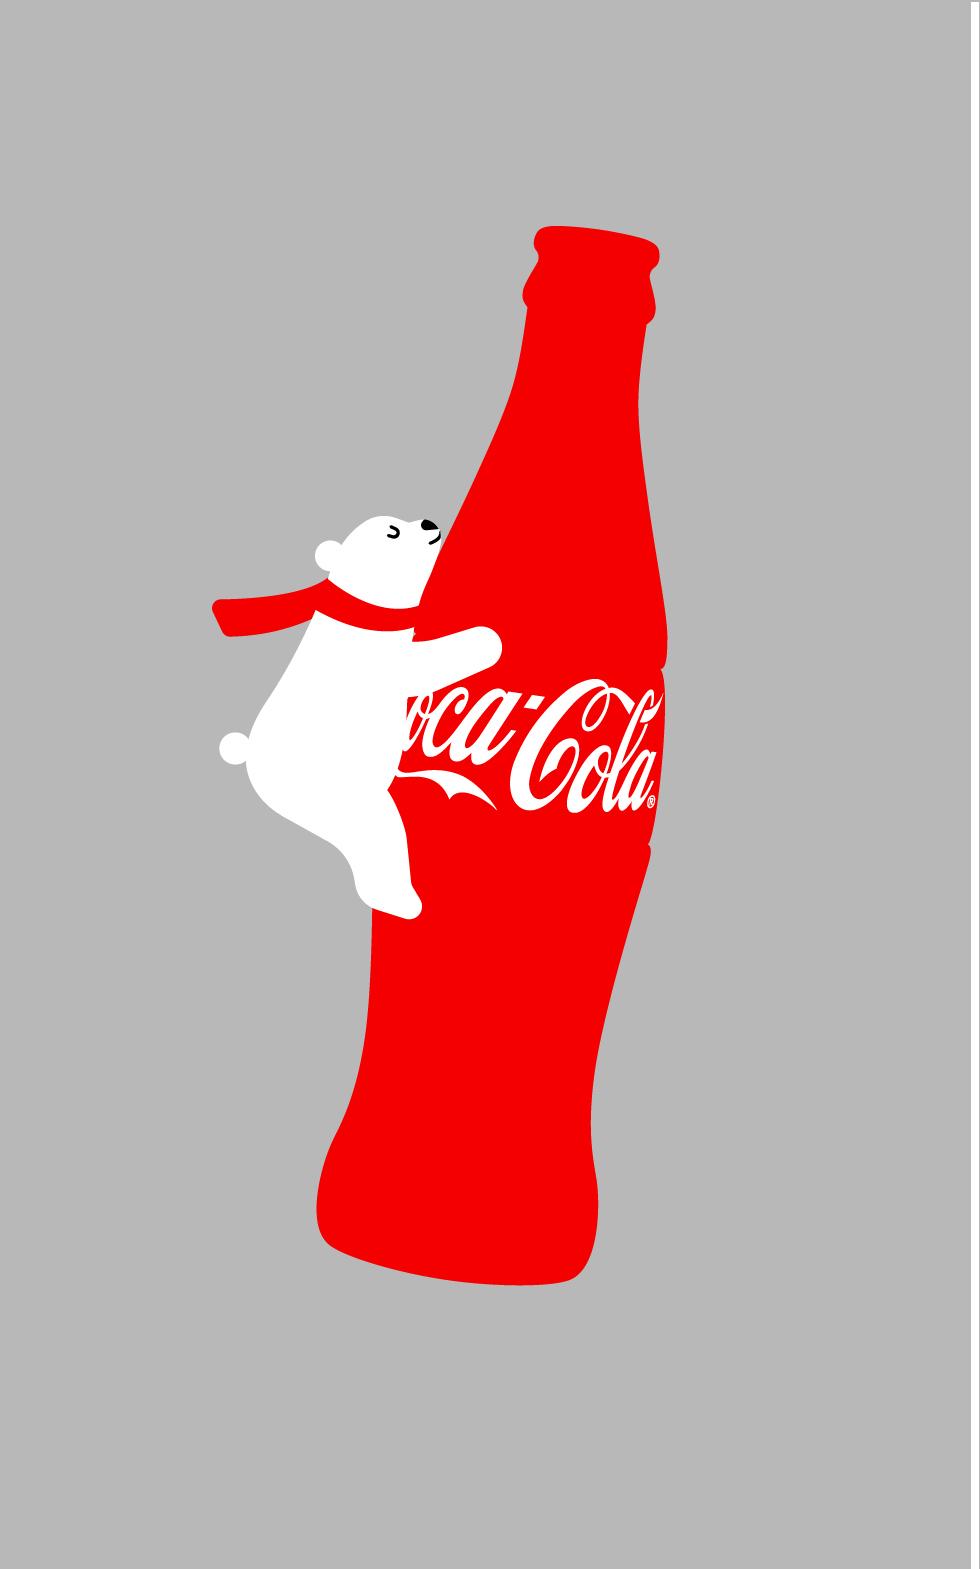 Coke_Thanksgiving_v14_ac_1 copy.jpg